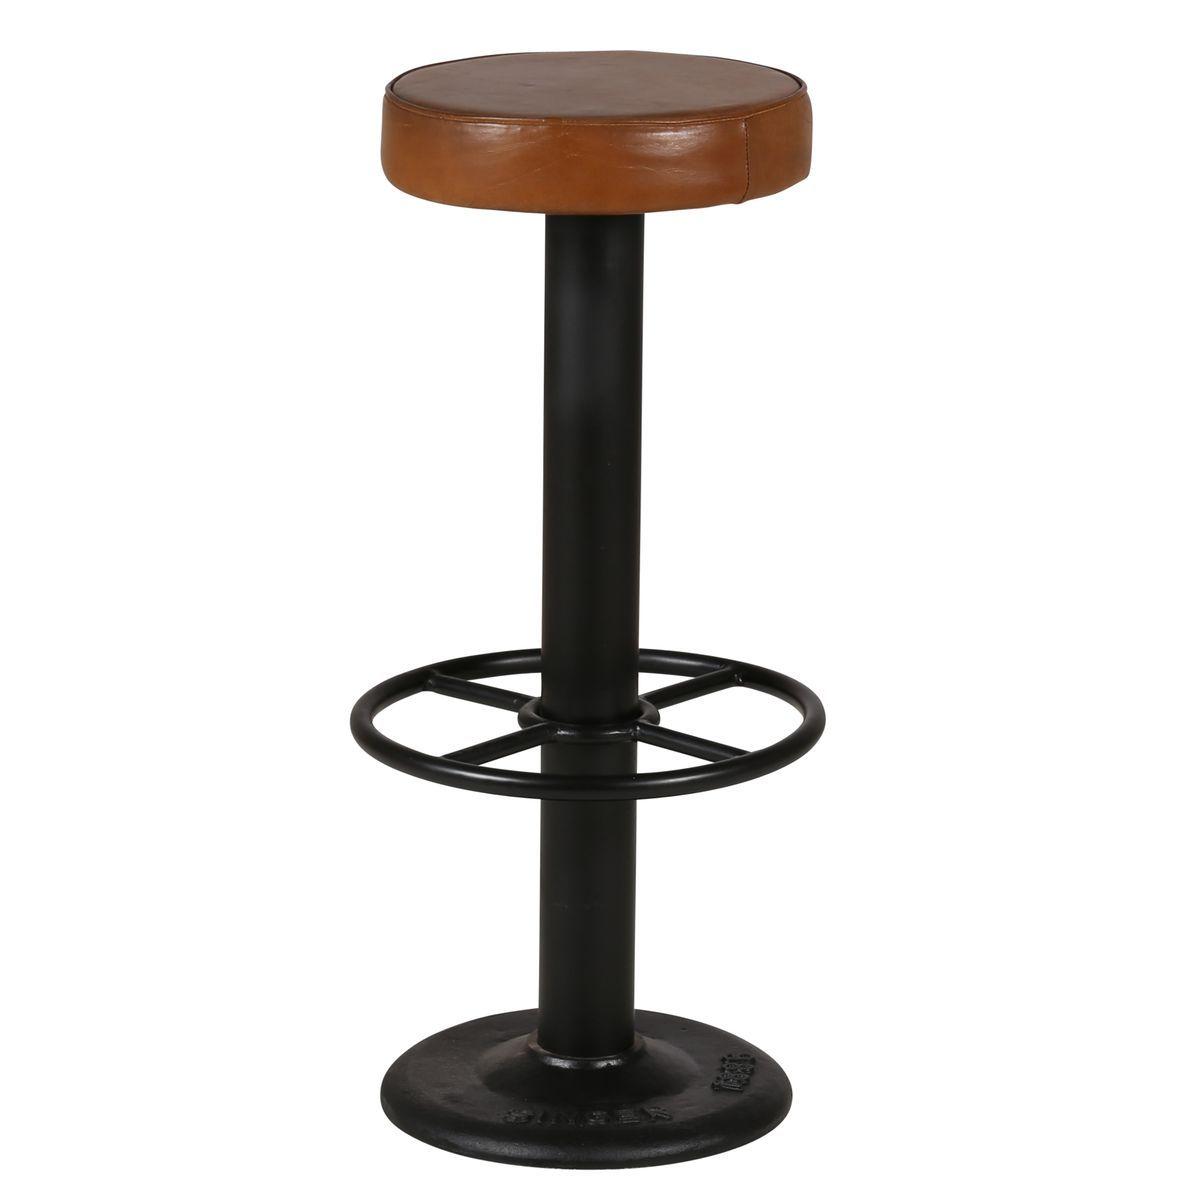 2x Tabouret De Bar Cuir Et Metal Noir Pub Marron Inwood La Redoute Mobile Mesas De Comedor Comedores